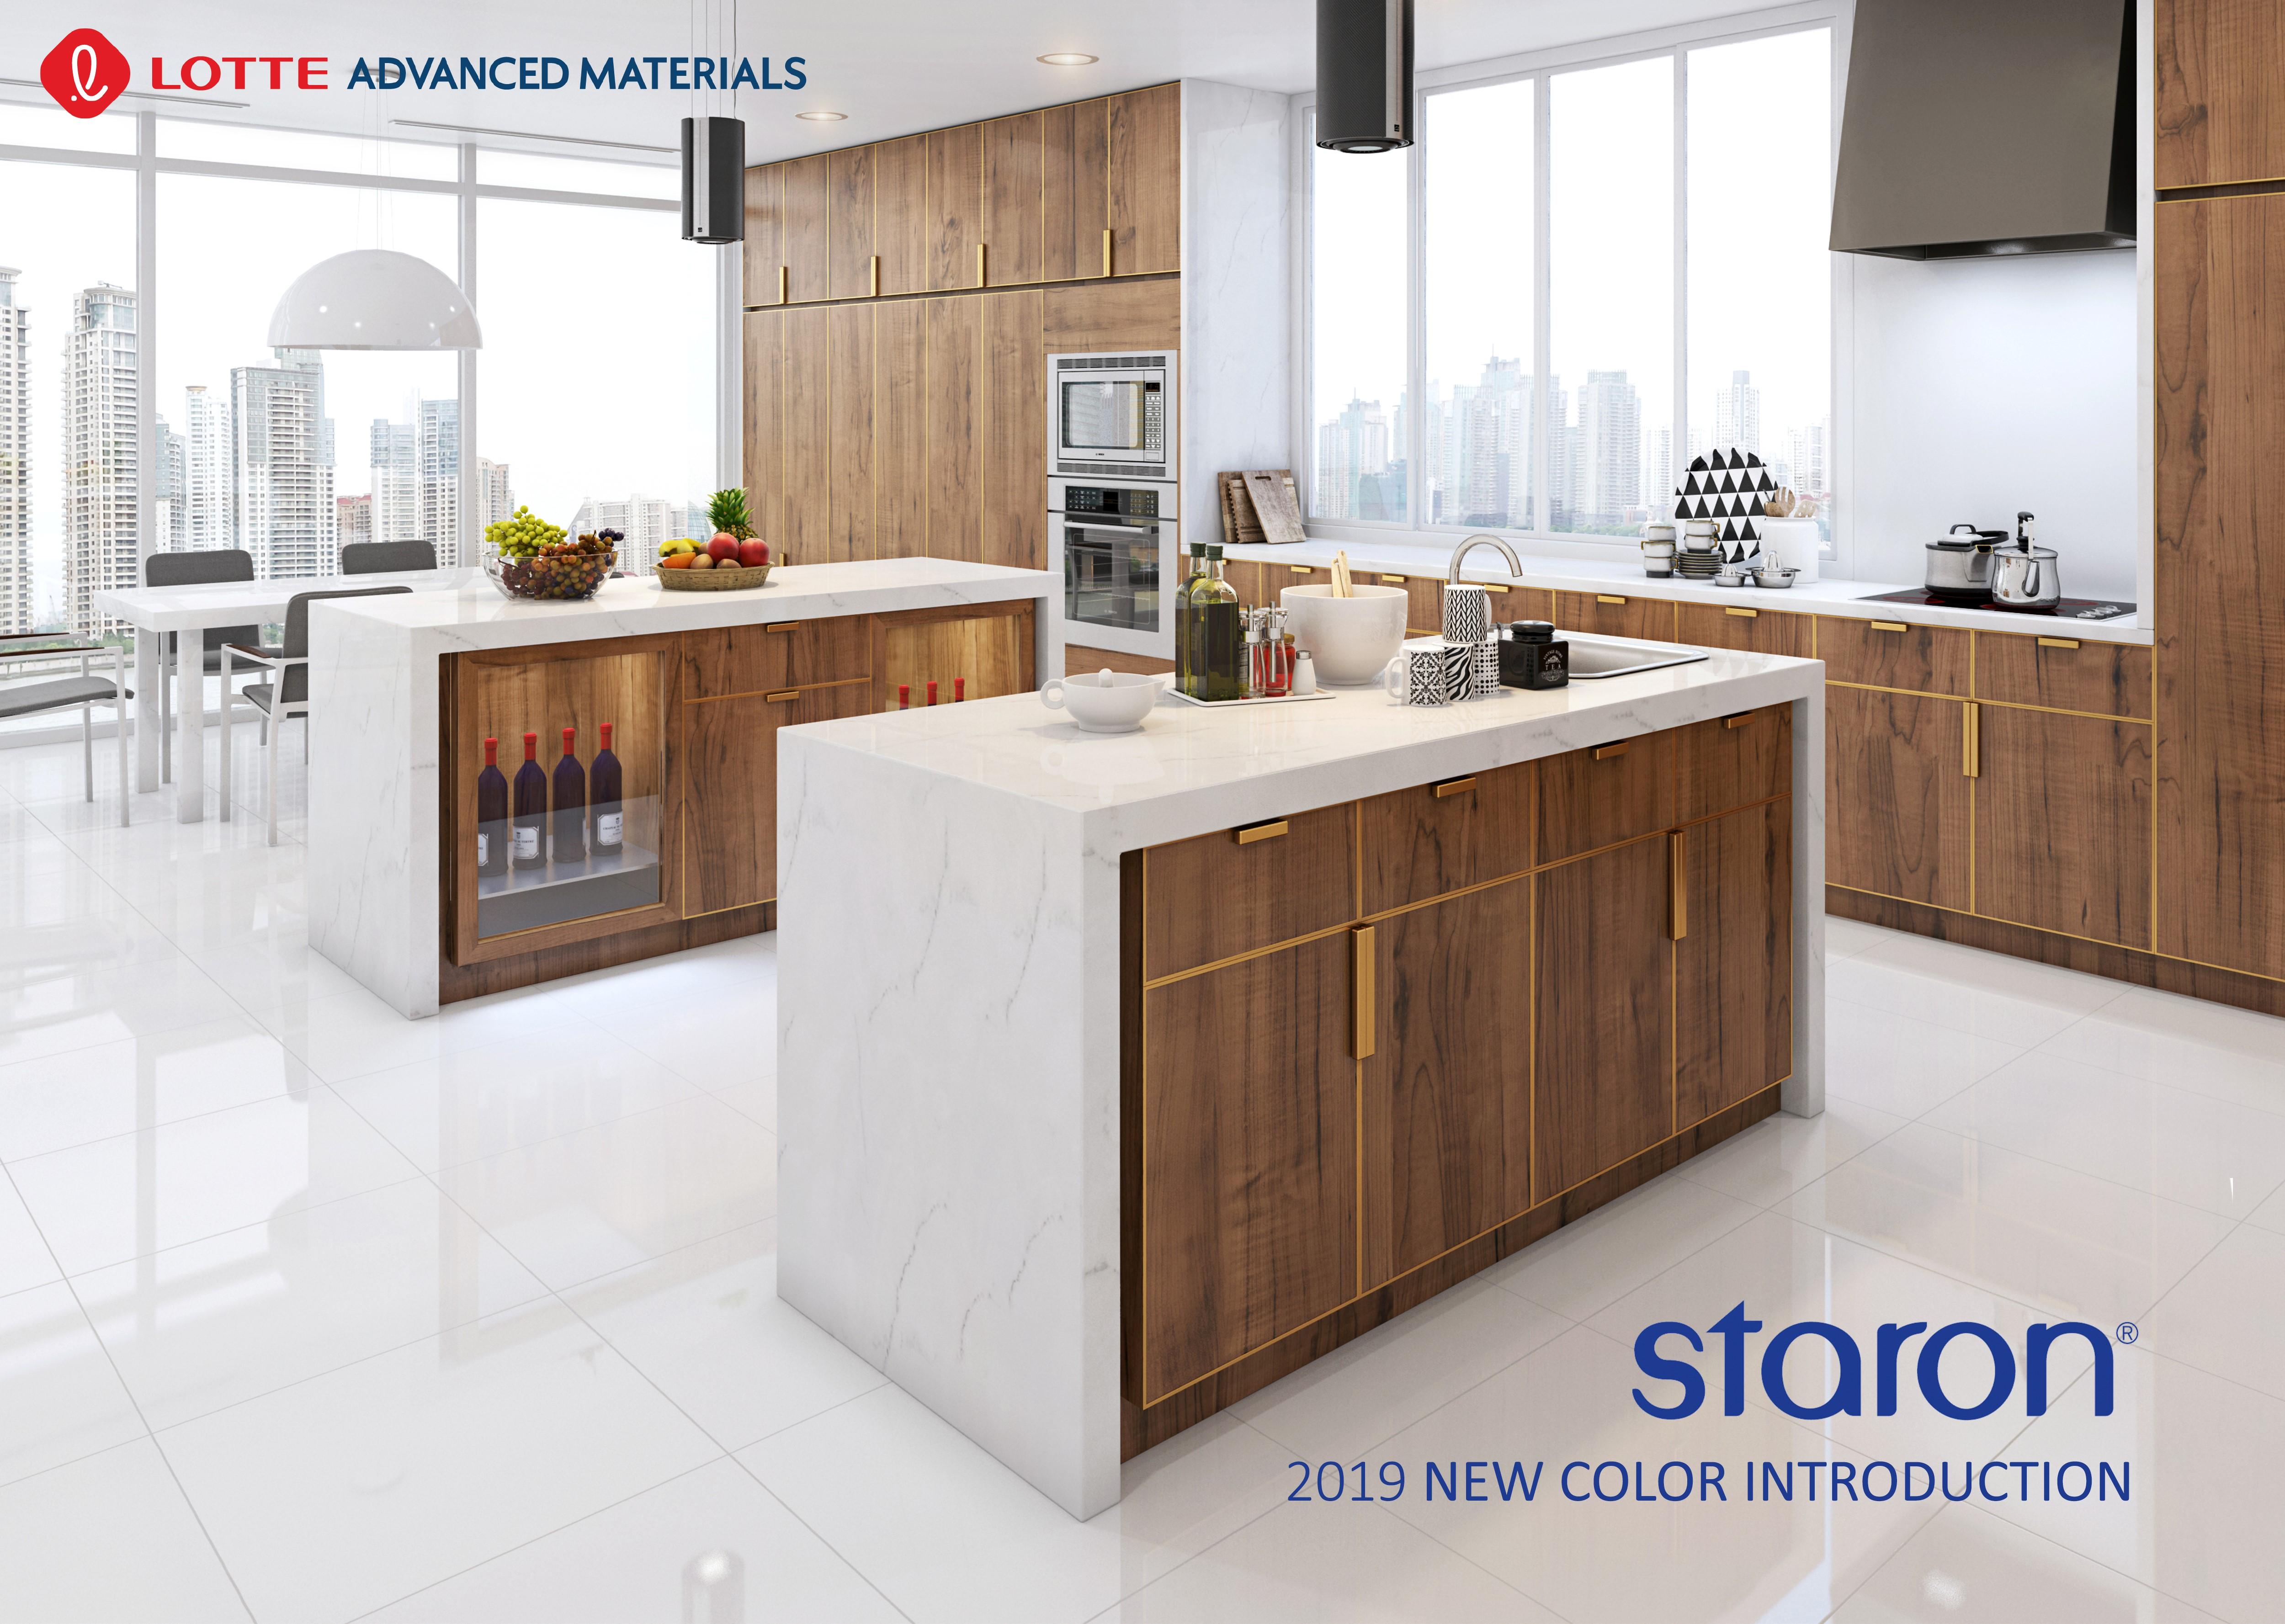 LOTTE Advanced Materials Introduces New Staron Colors